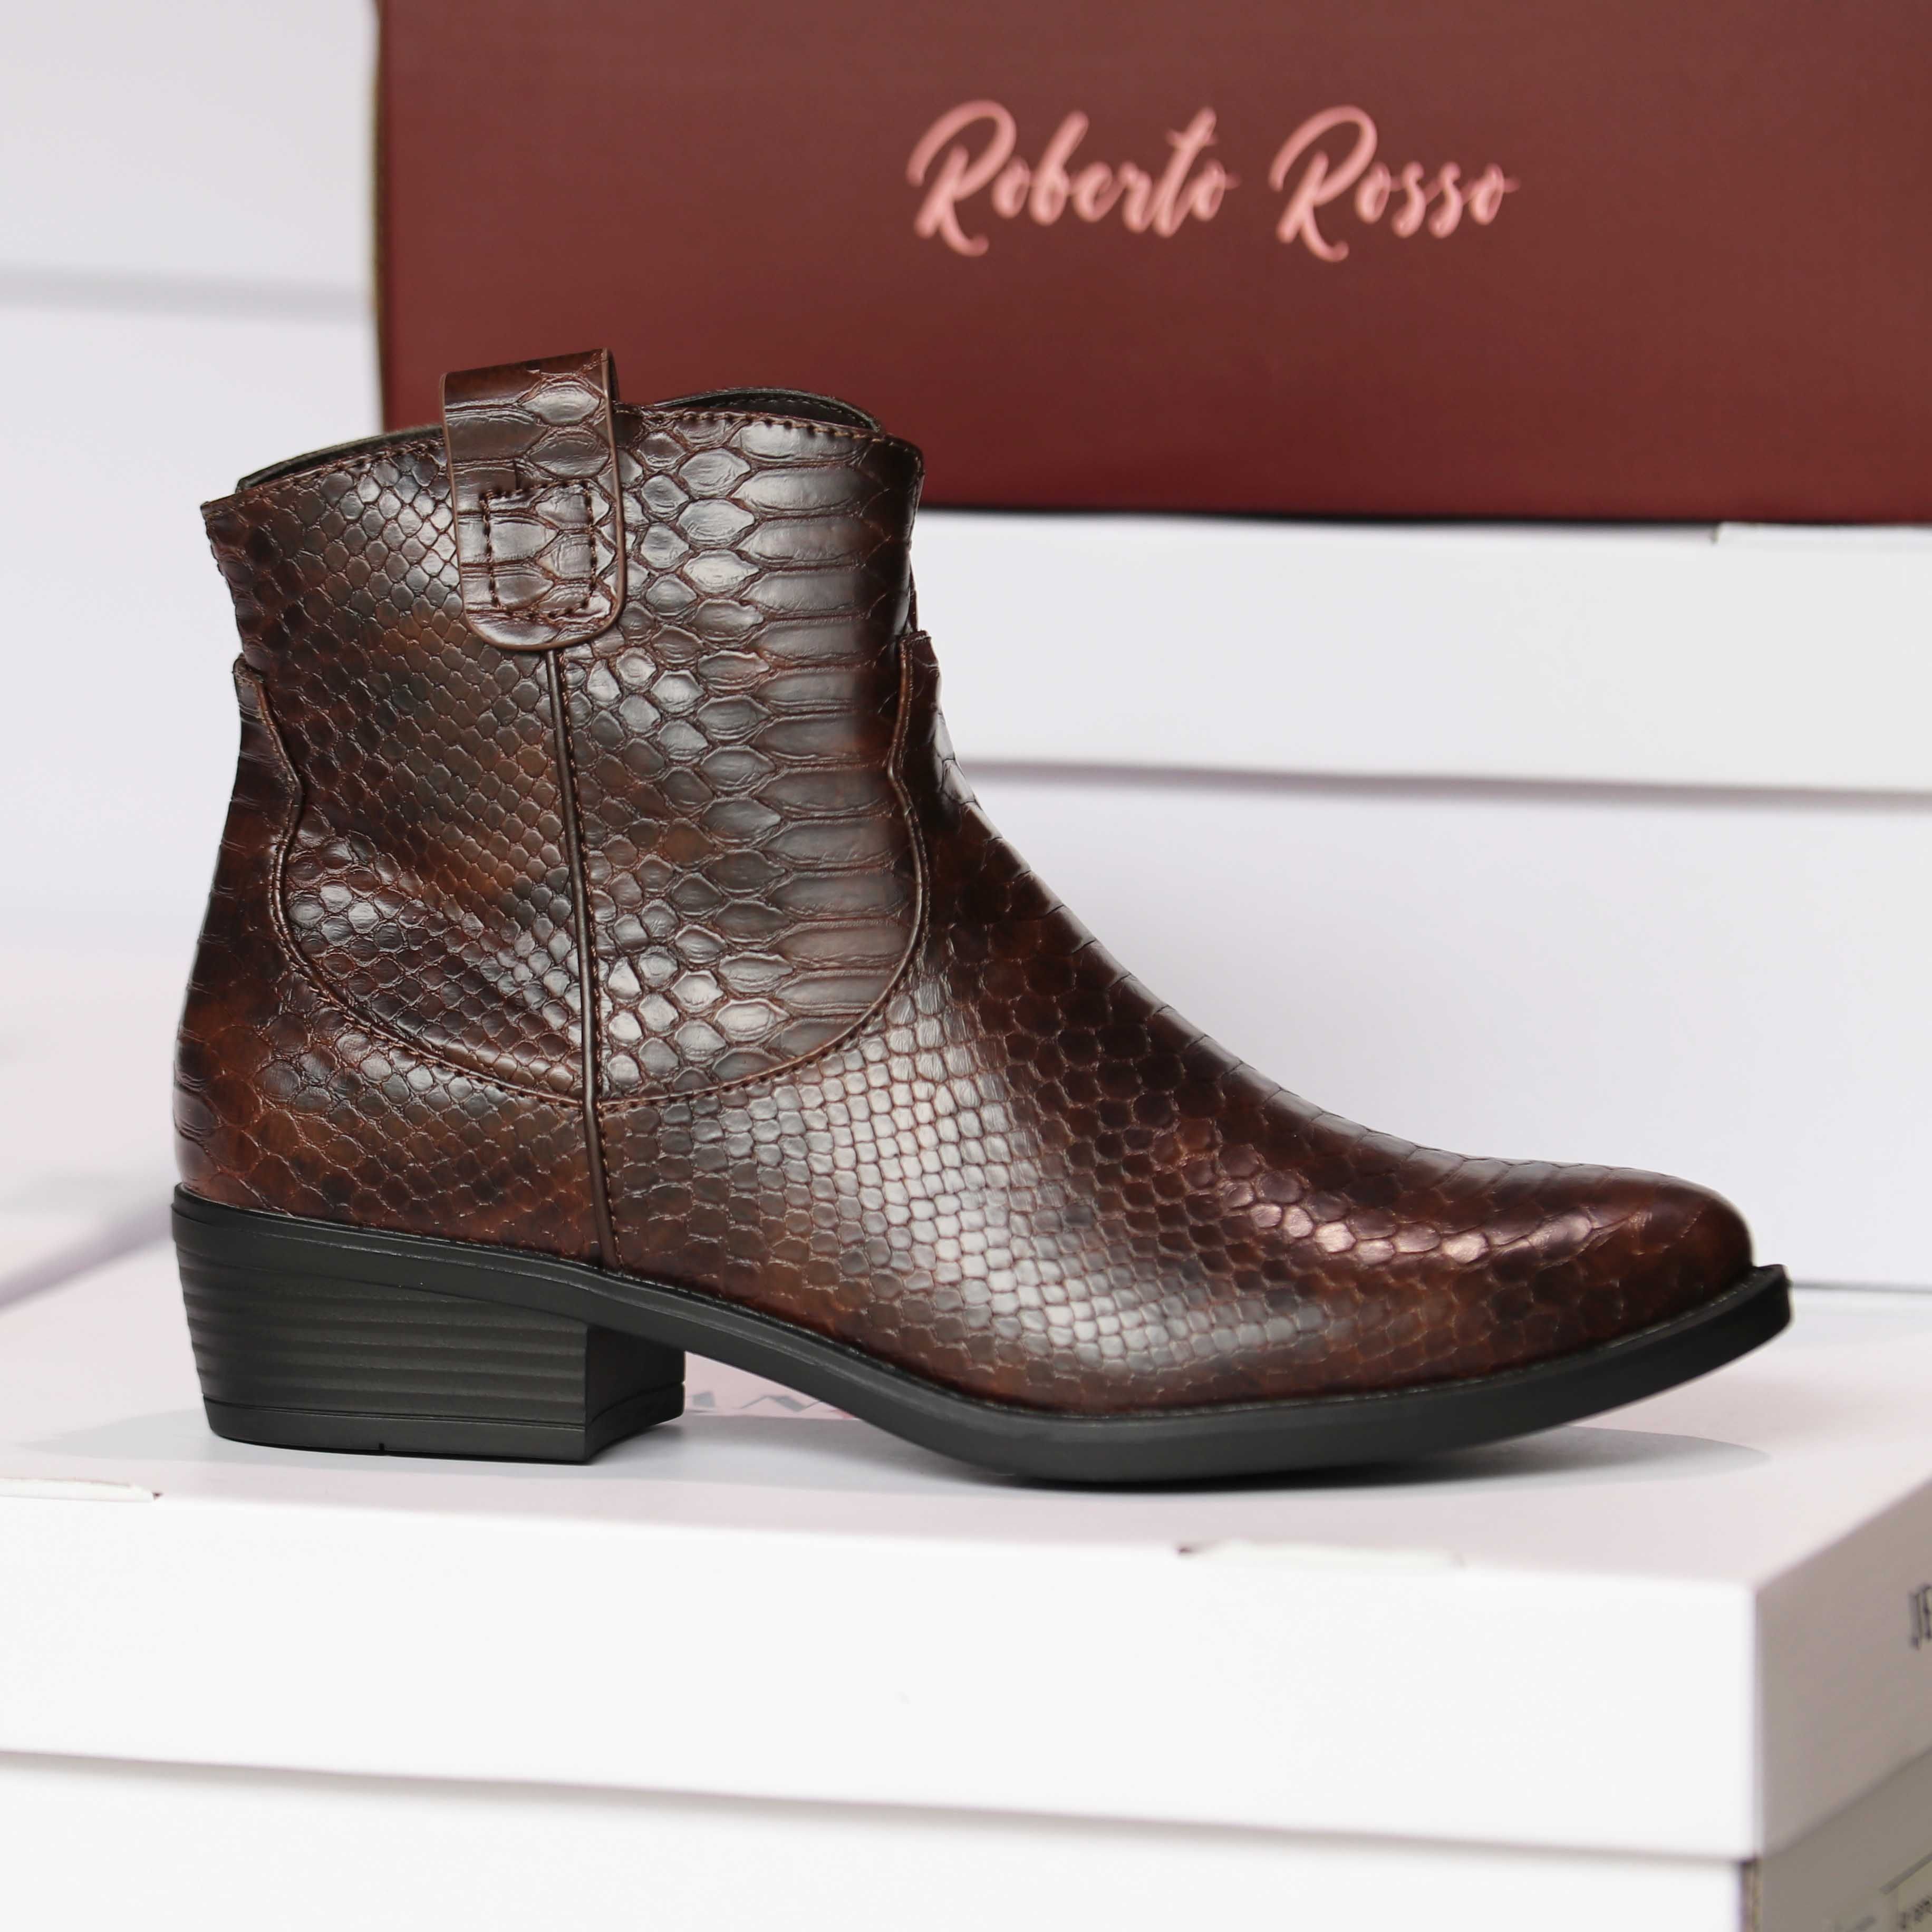 roberto rosso susy brown croco dame sko høst4